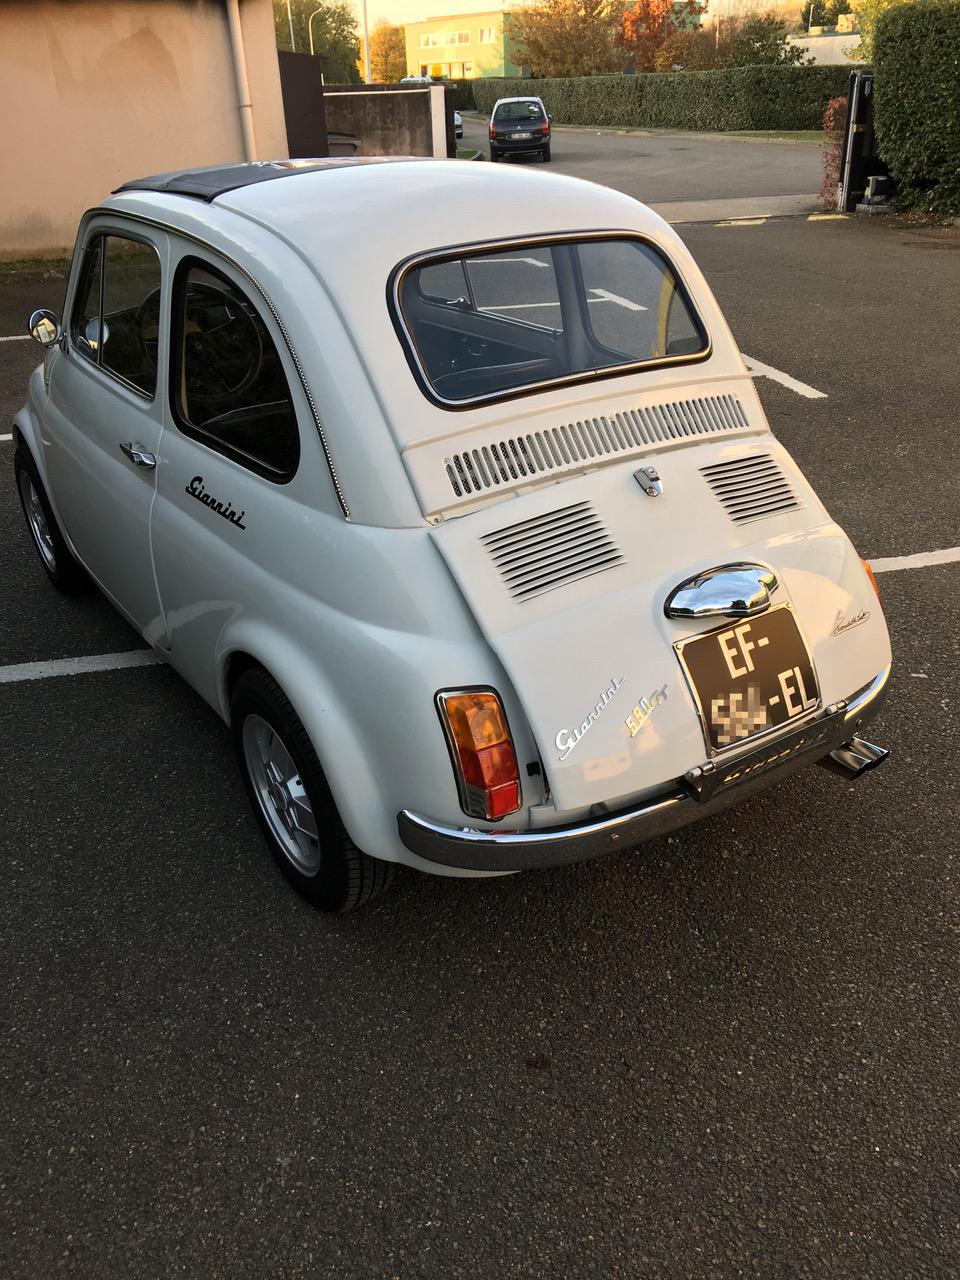 Vente 2 Fiat 500 Img_3211